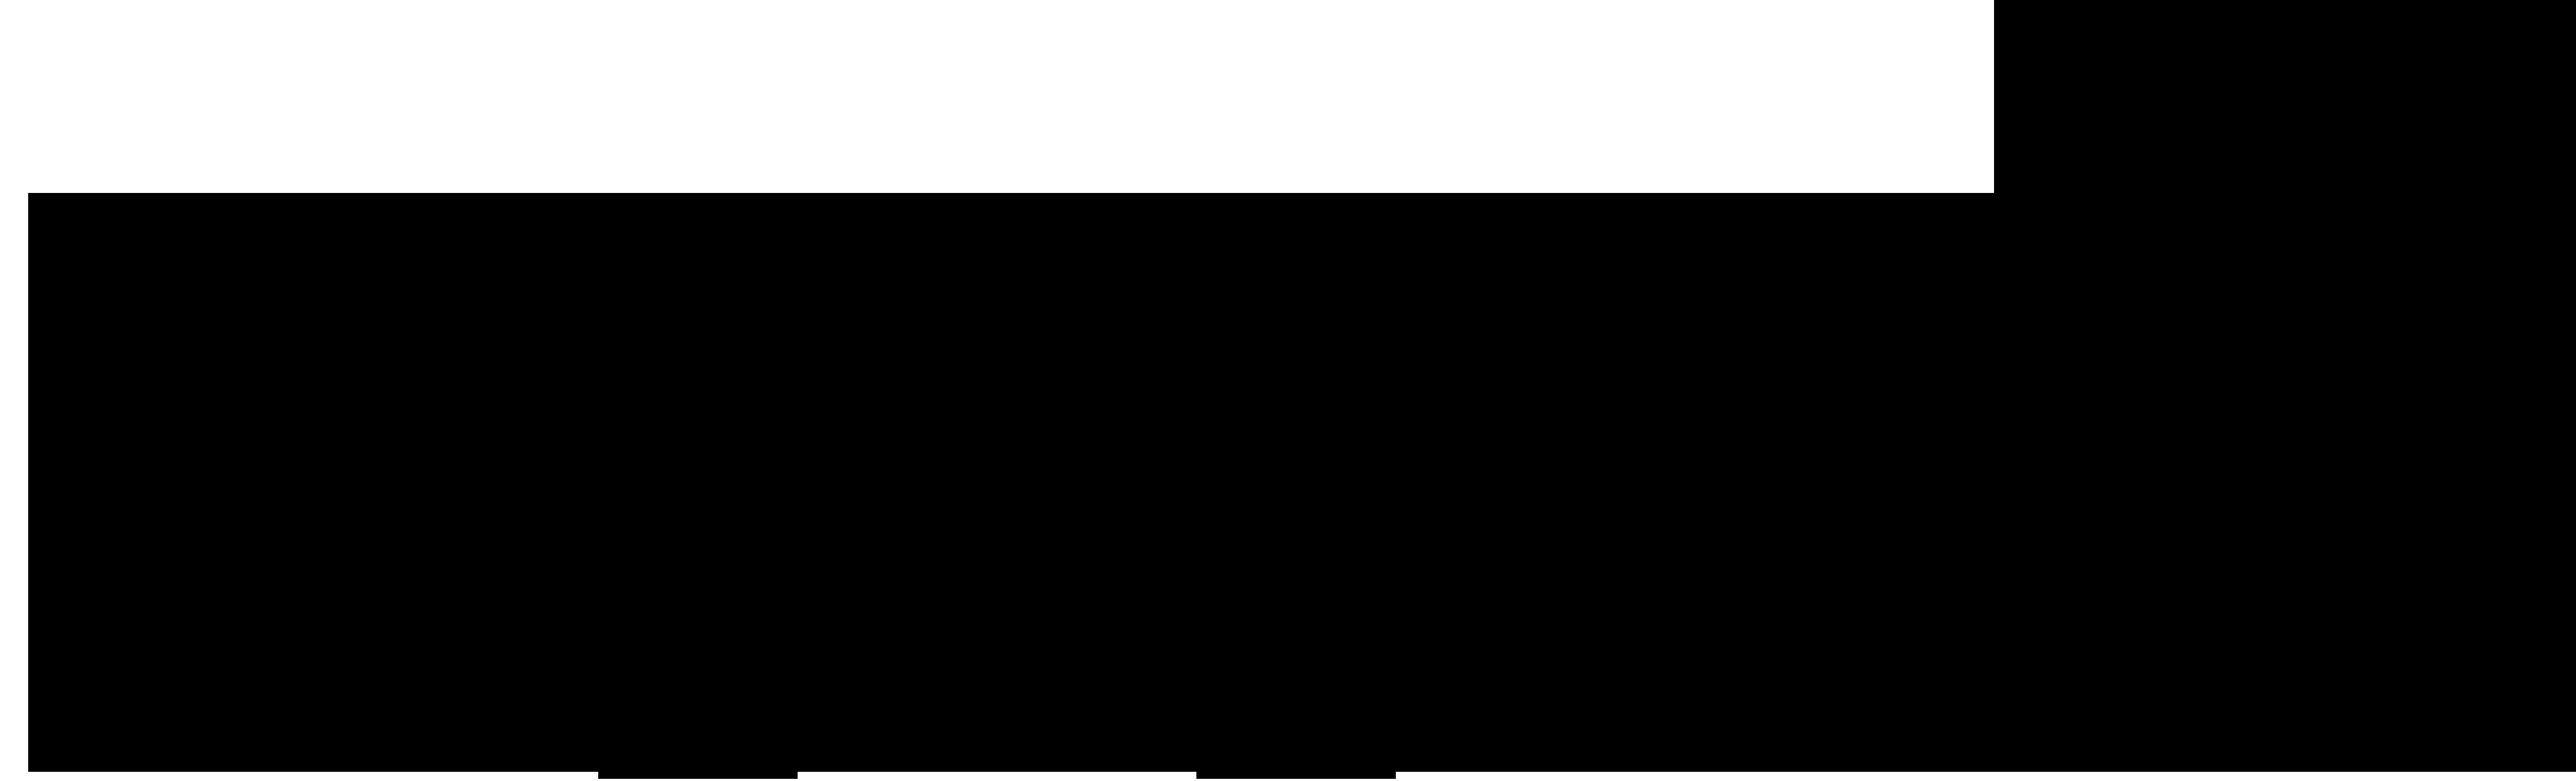 Dahlsan AB Logo Svart